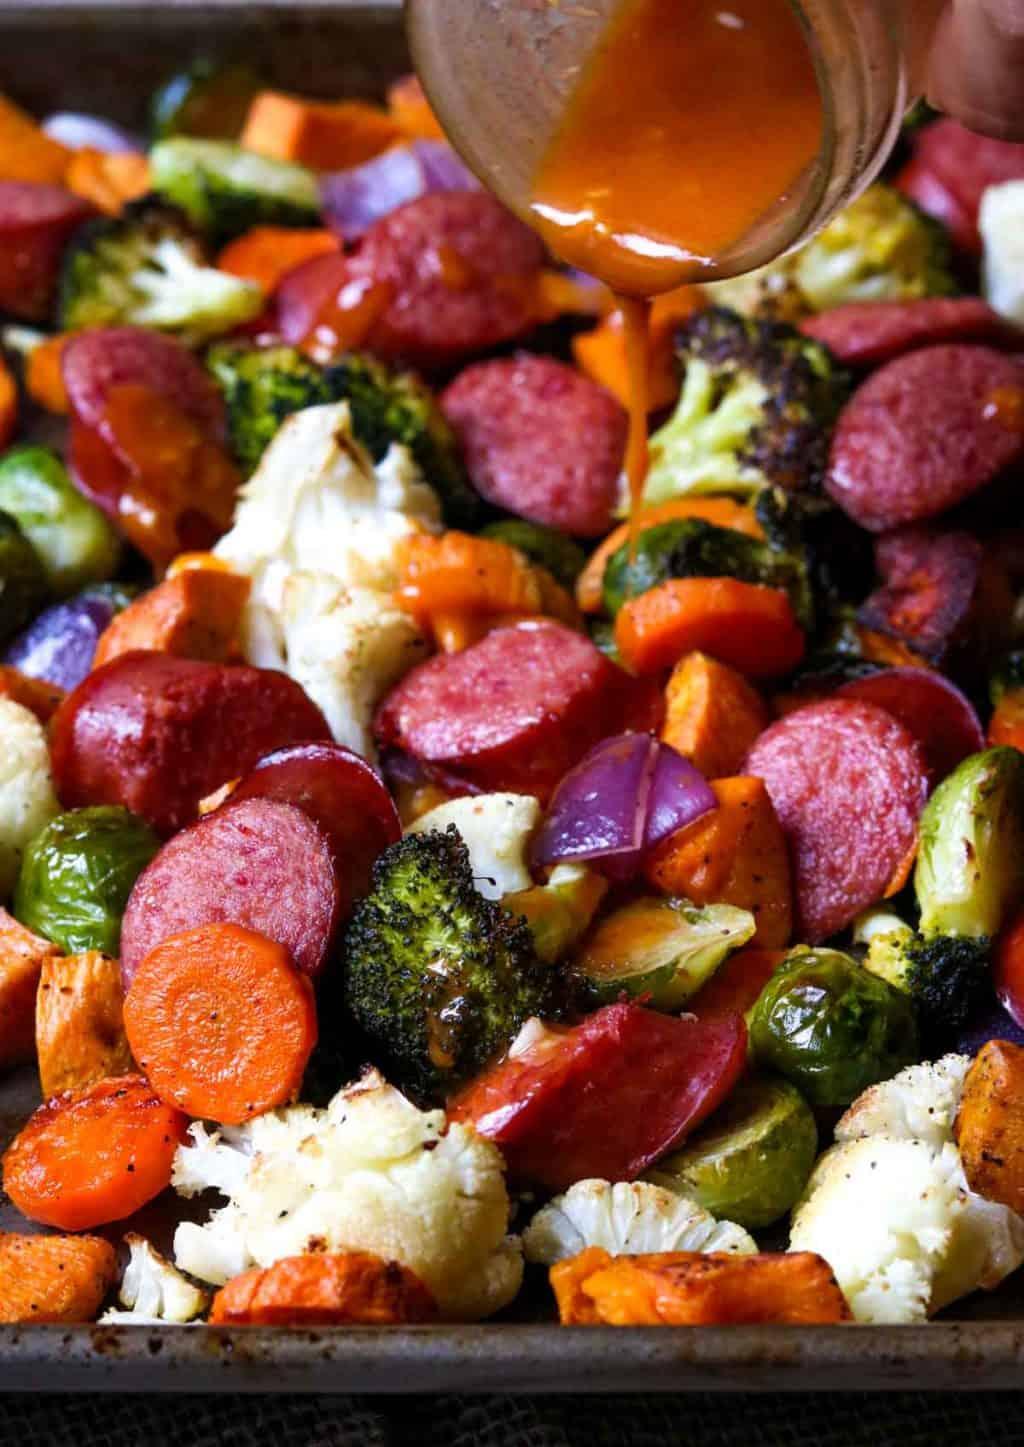 Sheet pan beef sausage and veggies with smoked paprika vinaigrette